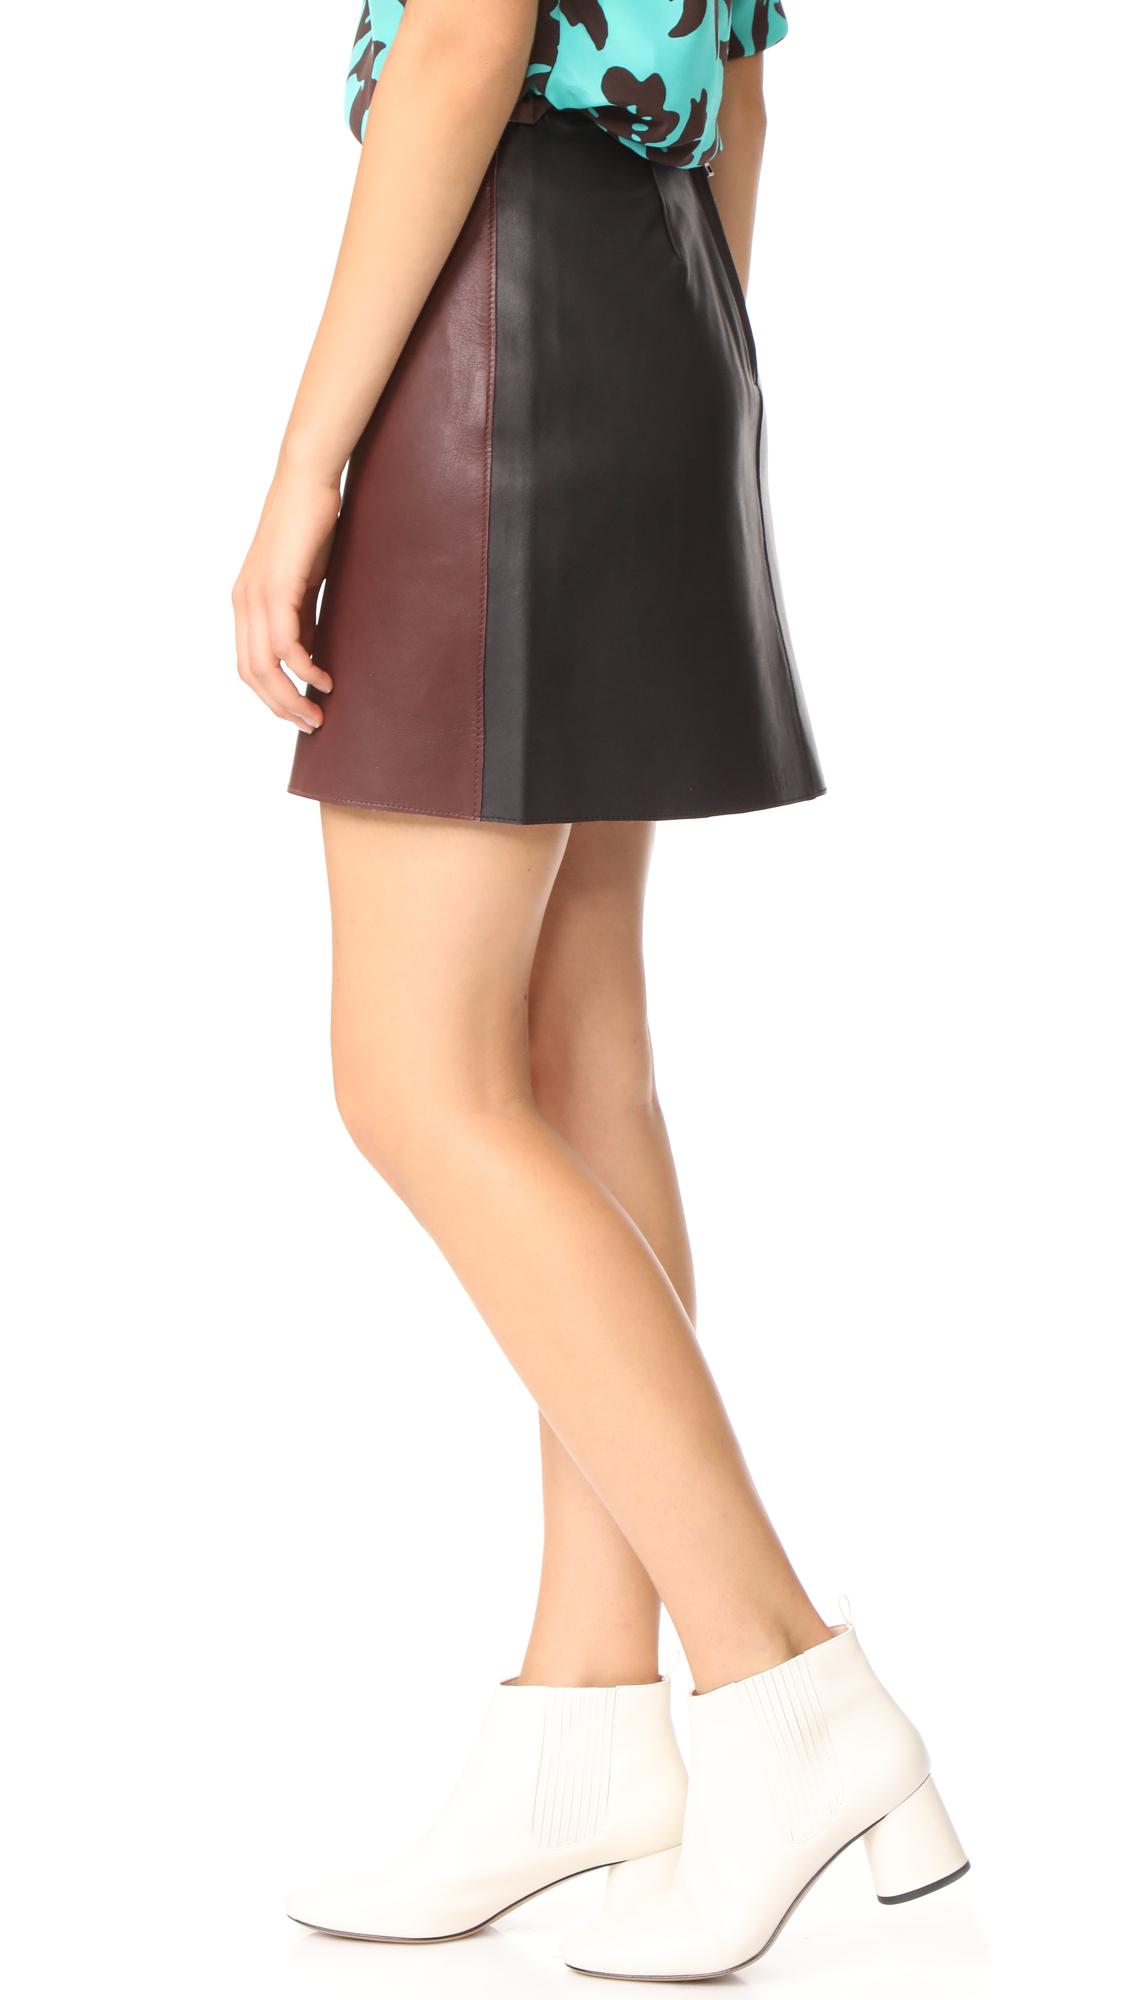 Diane von Furstenberg Jenny Leather Miniskirt - Chestnut/Black